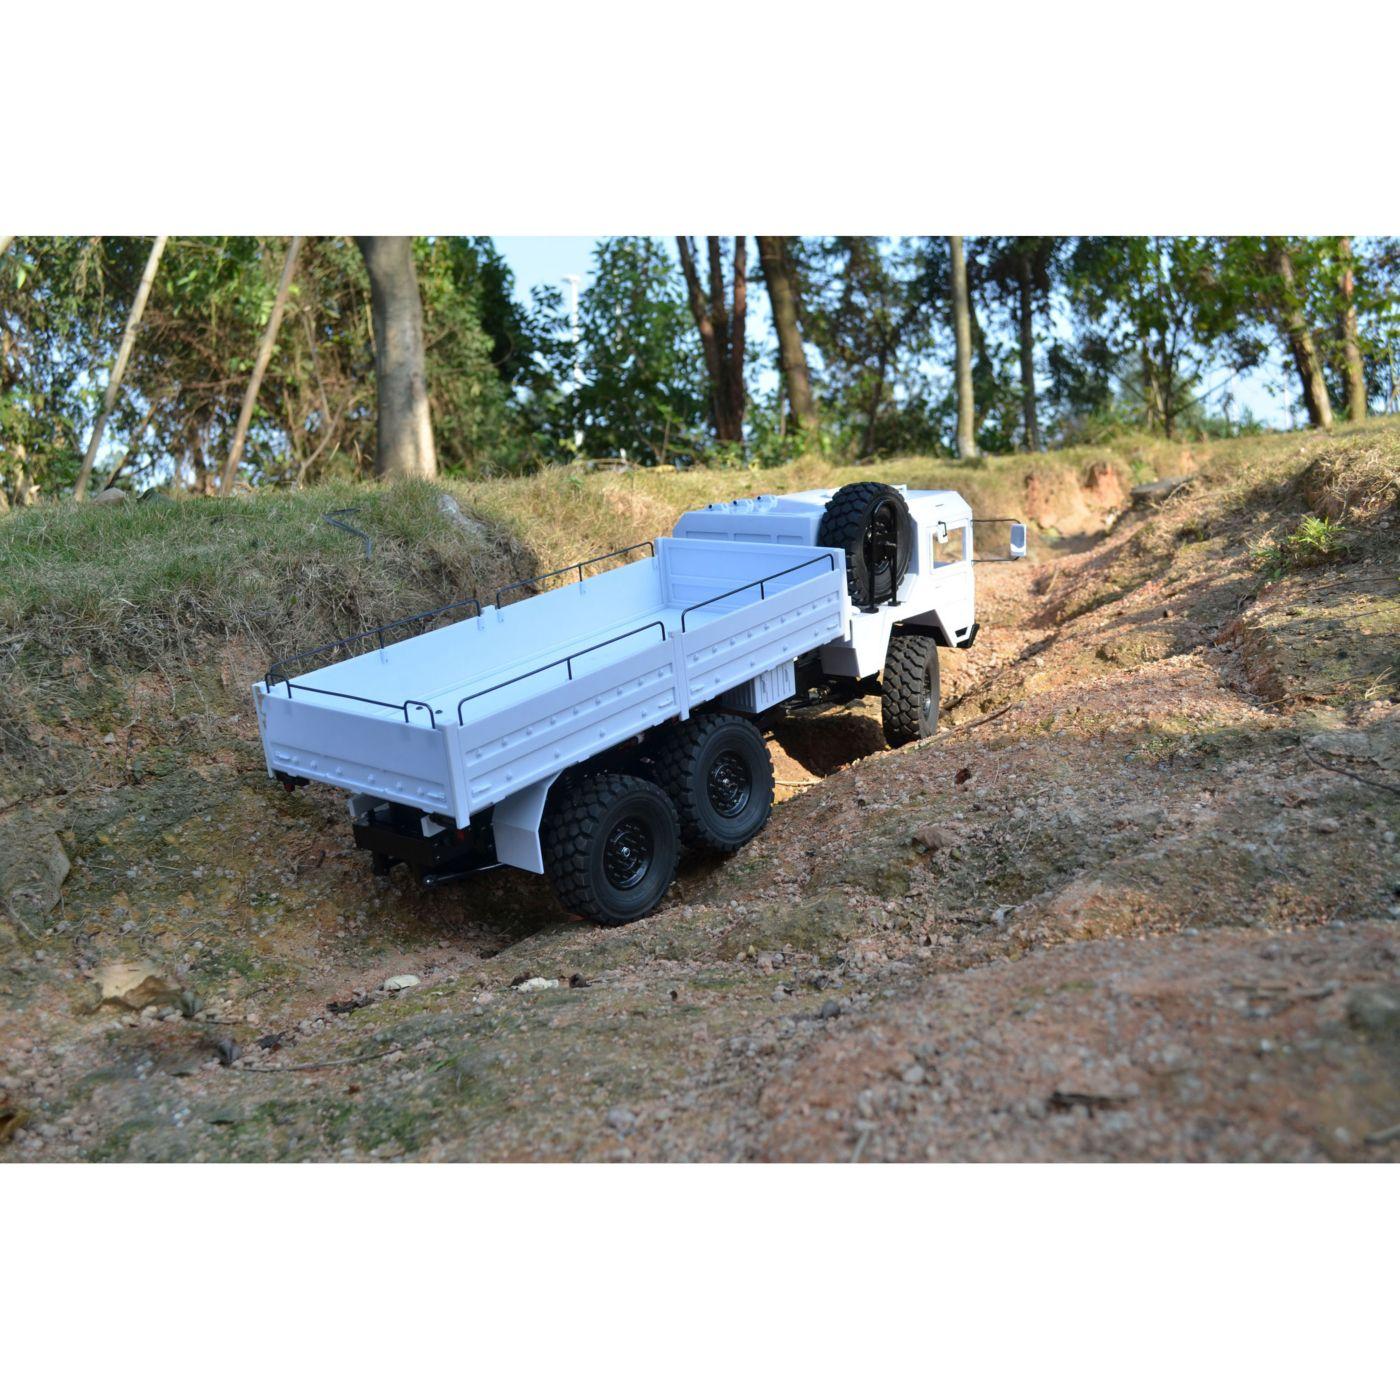 1/14 Beast II 6x6 Truck Kit  (RC4ZK0052)